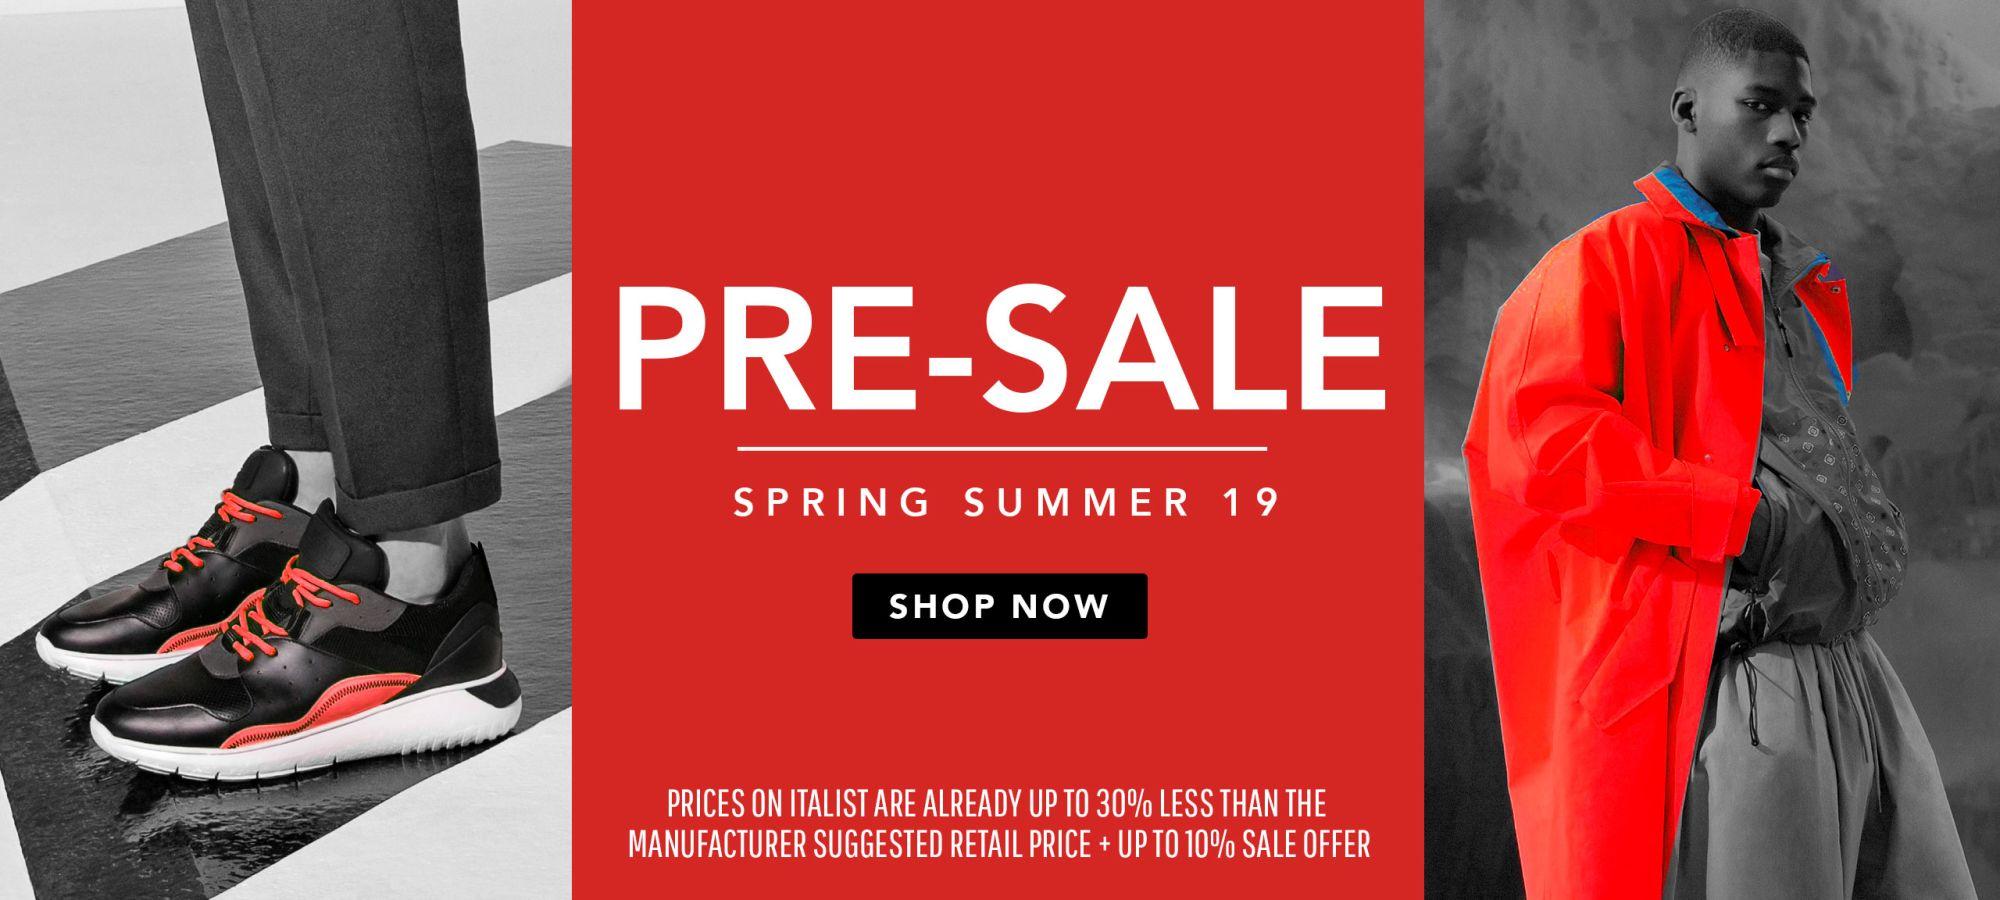 Men Spring Summer Presale 2019 by italist